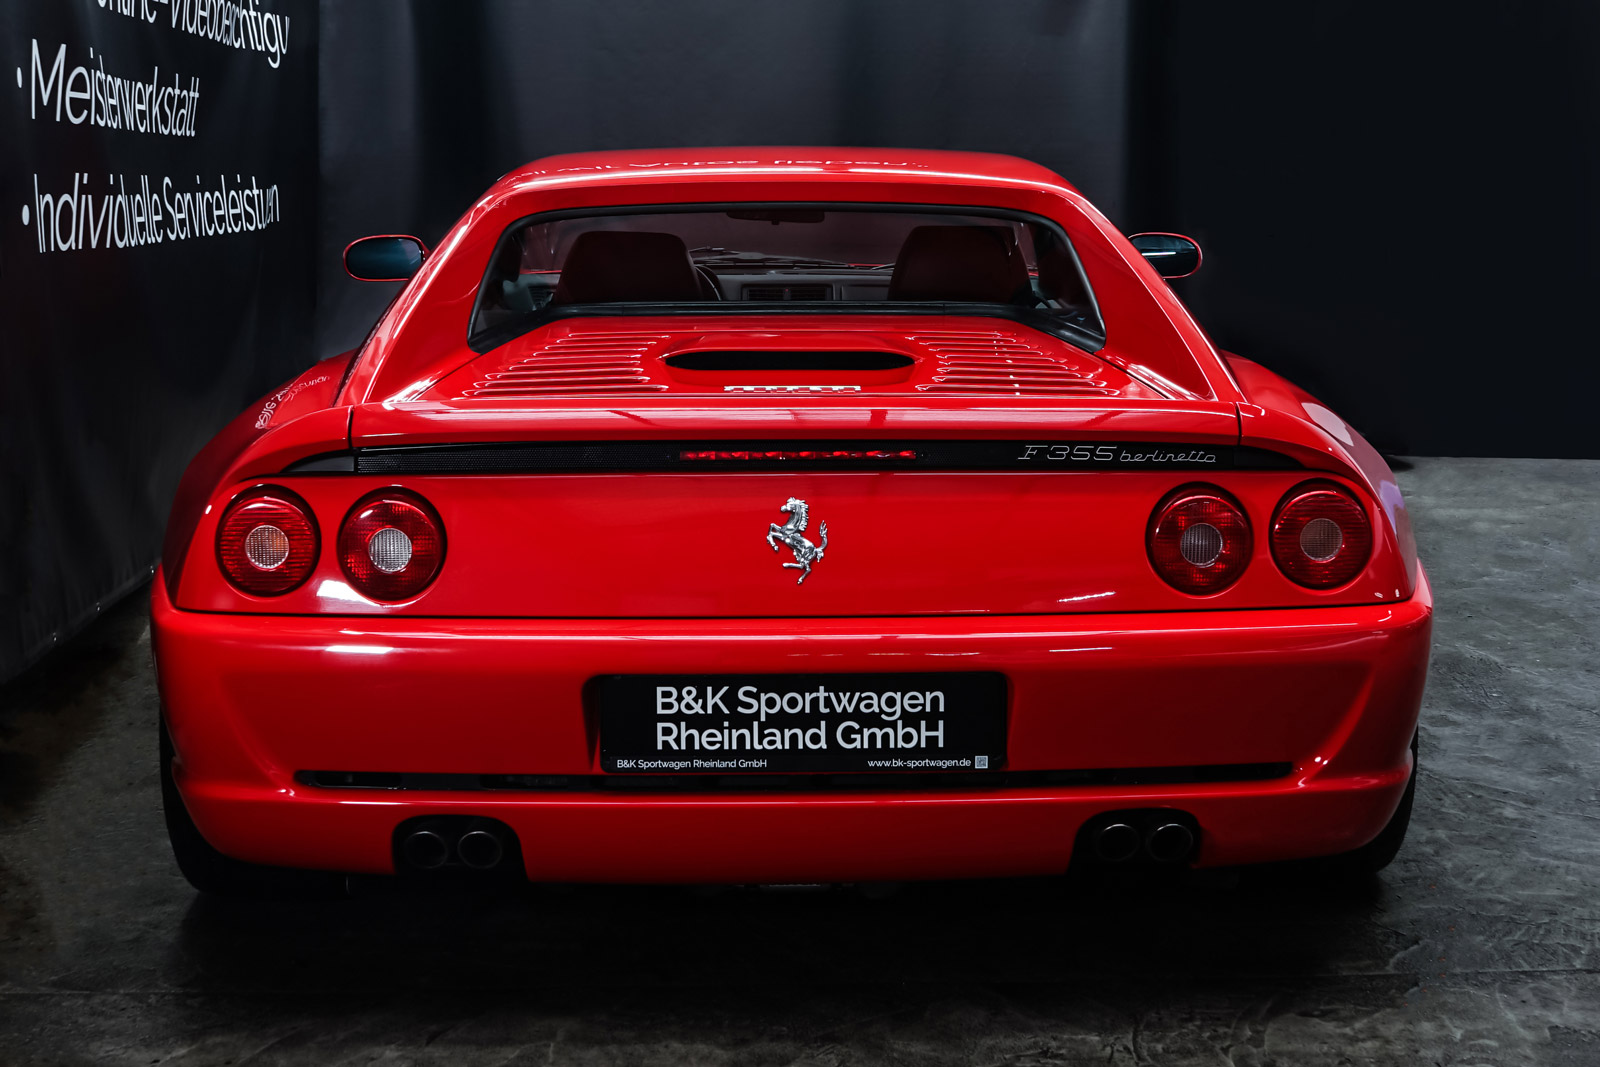 Ferrari_F355_Berlinetta_Rot_Schwarz_FER-7159_14_w